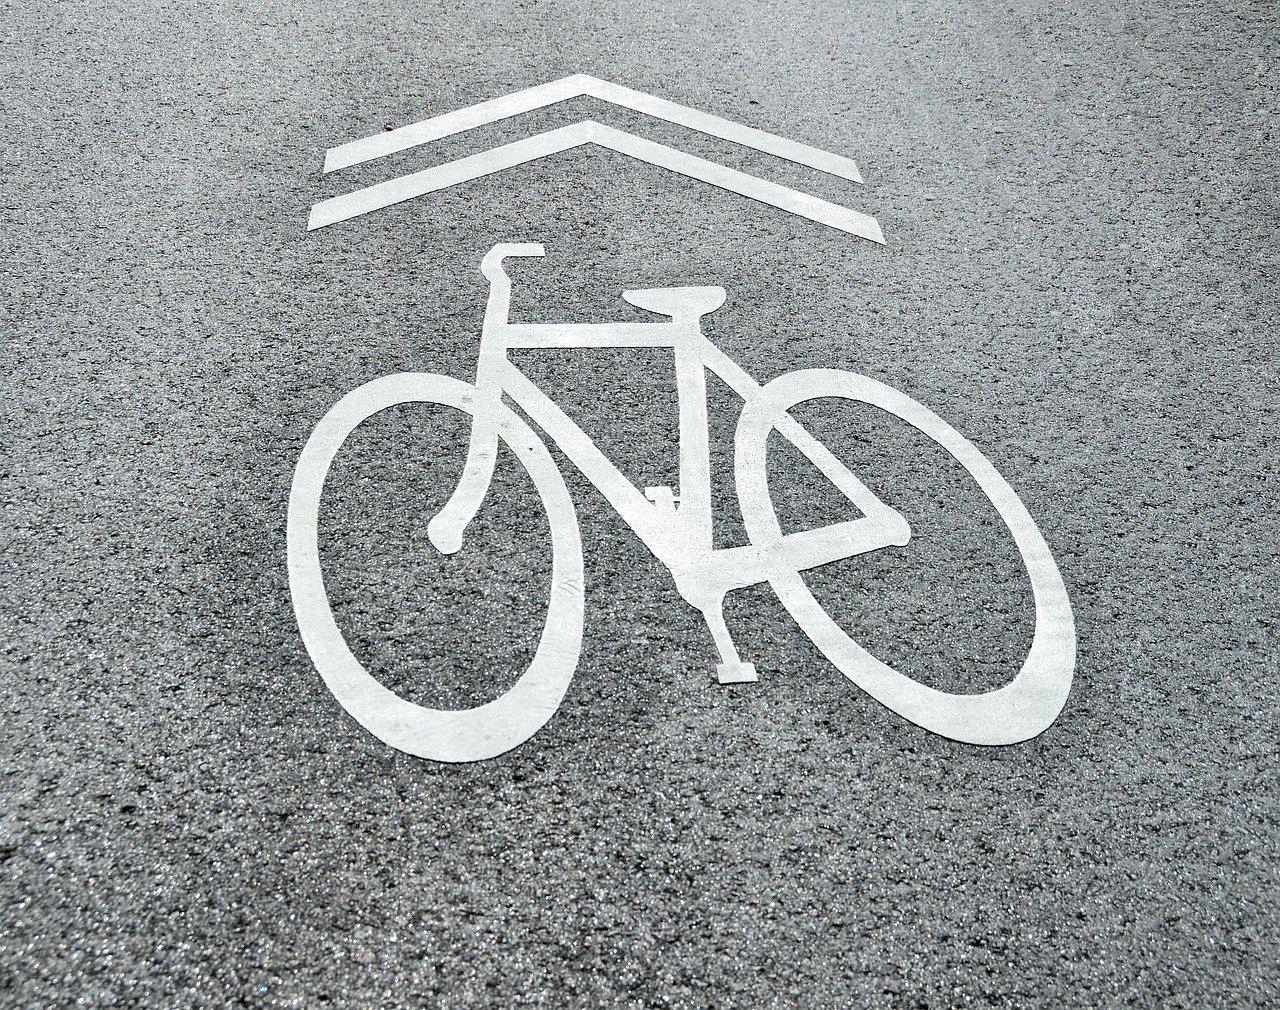 Cykelsymbol